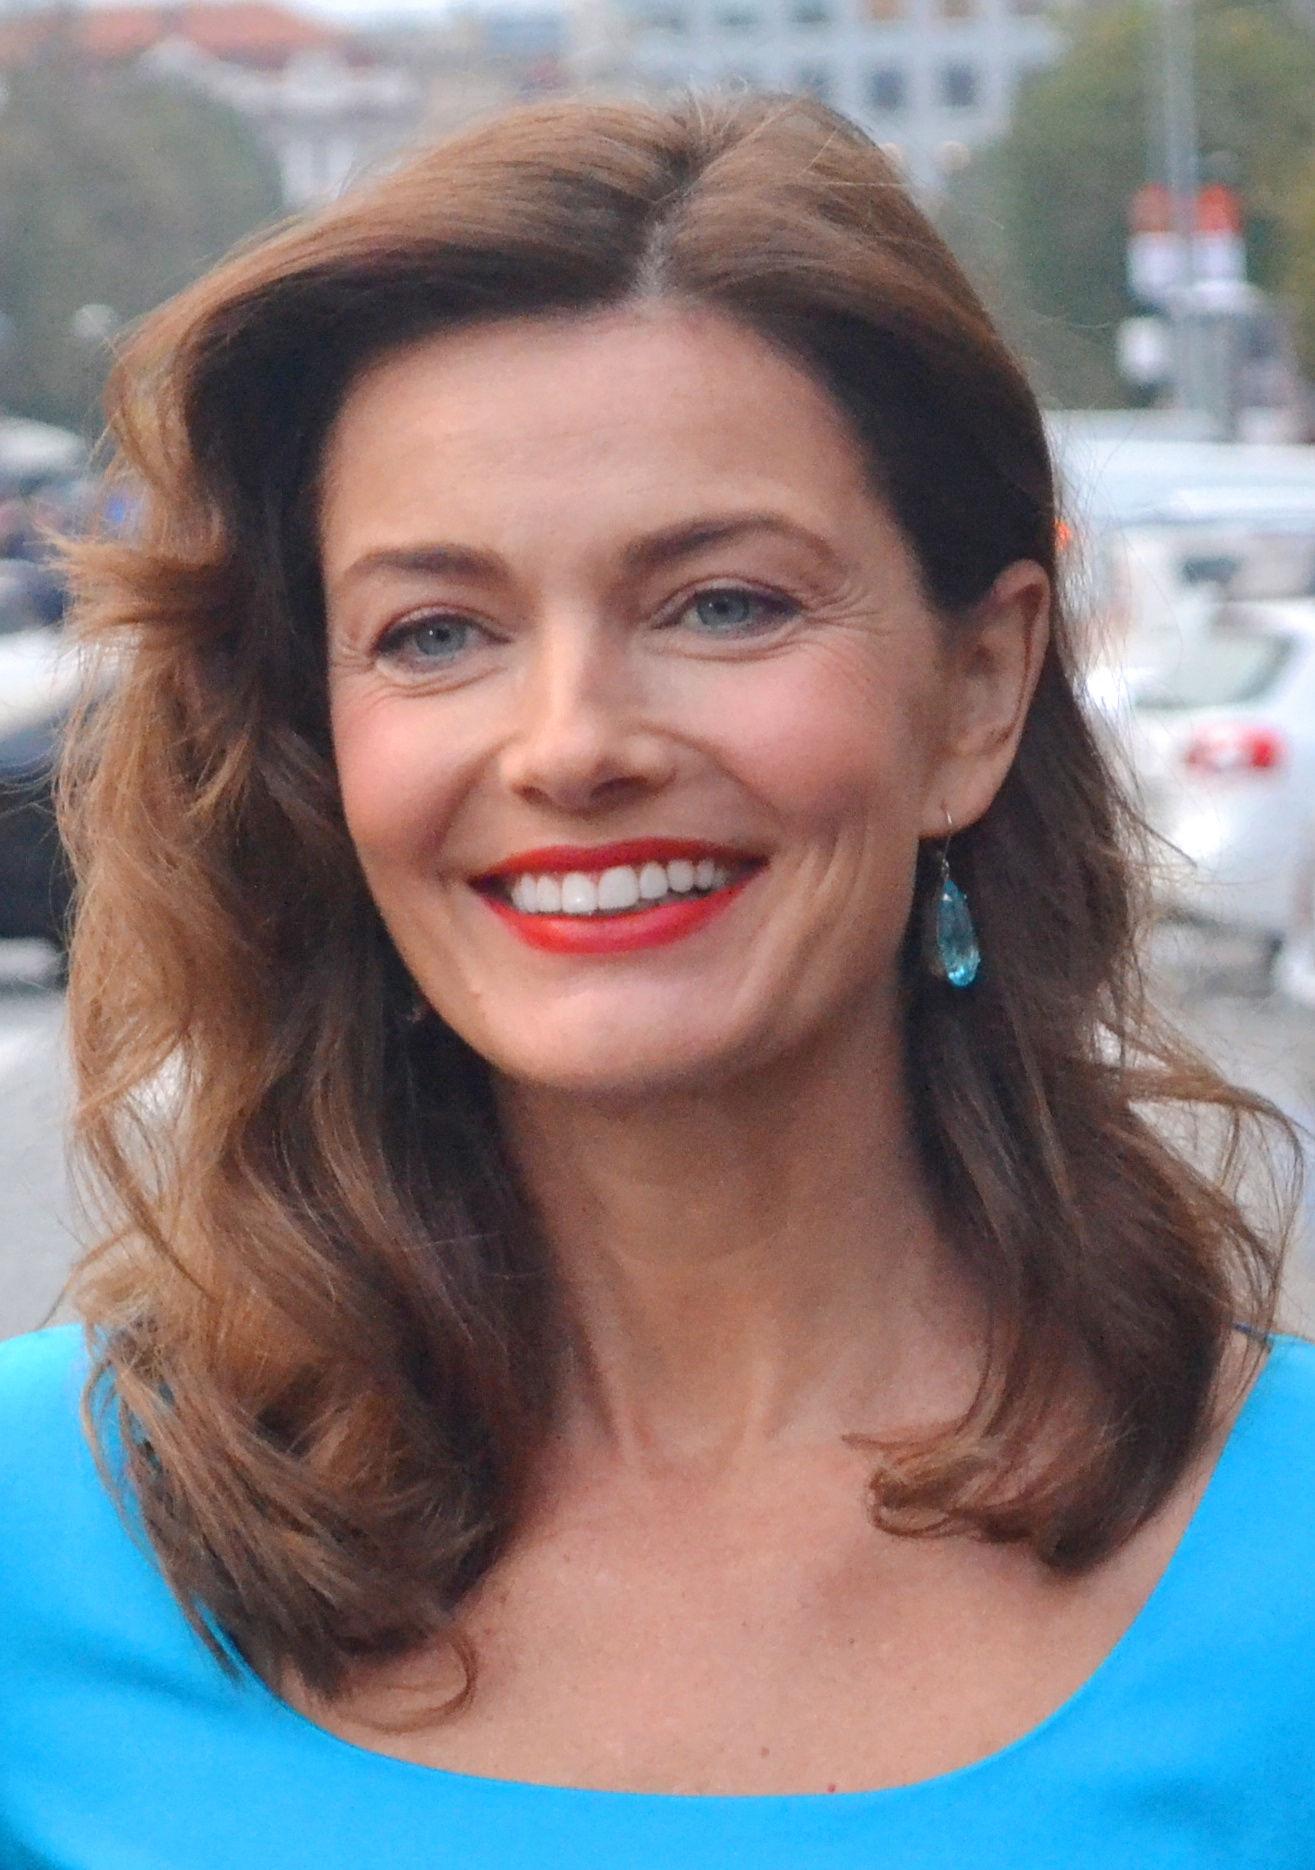 Photo of Paulina Porizkova: Czech-American model and actress